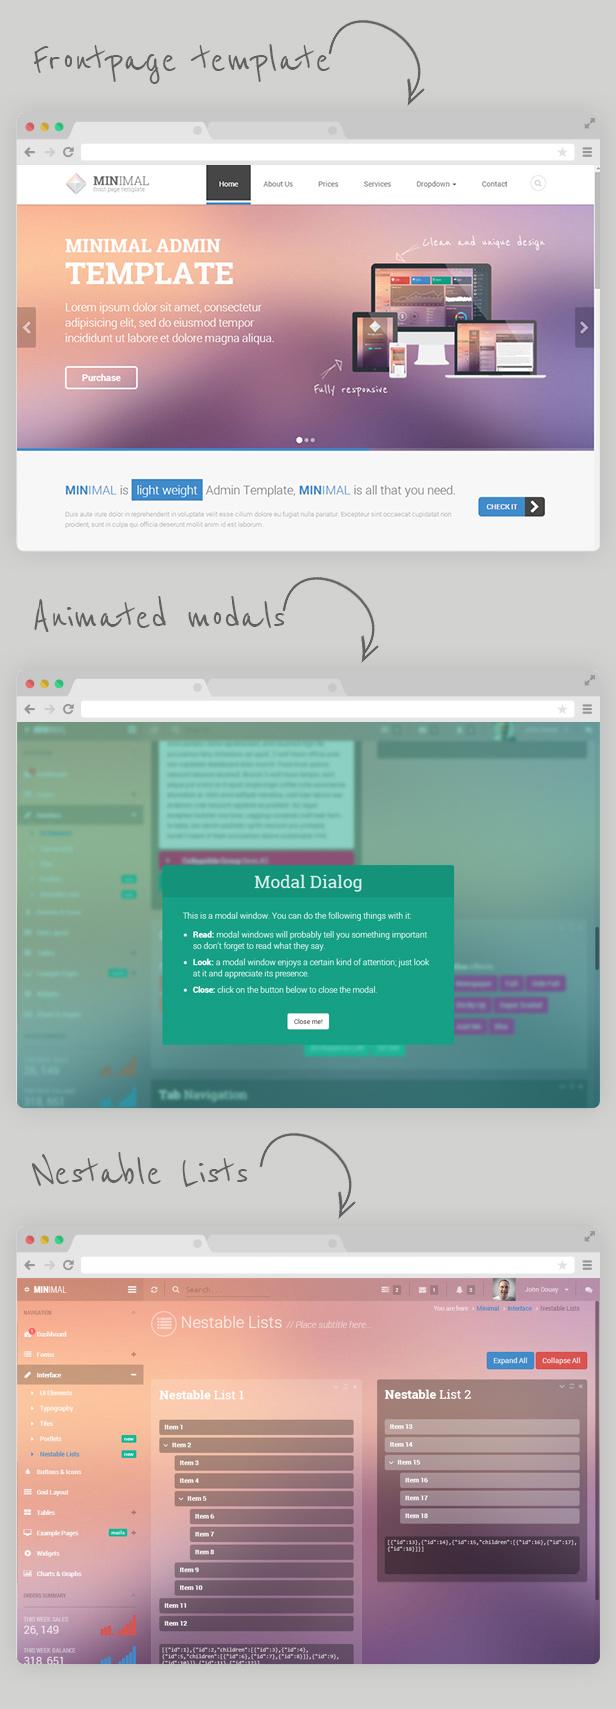 highlights new version 12 - Minimal - Responsive Admin Template